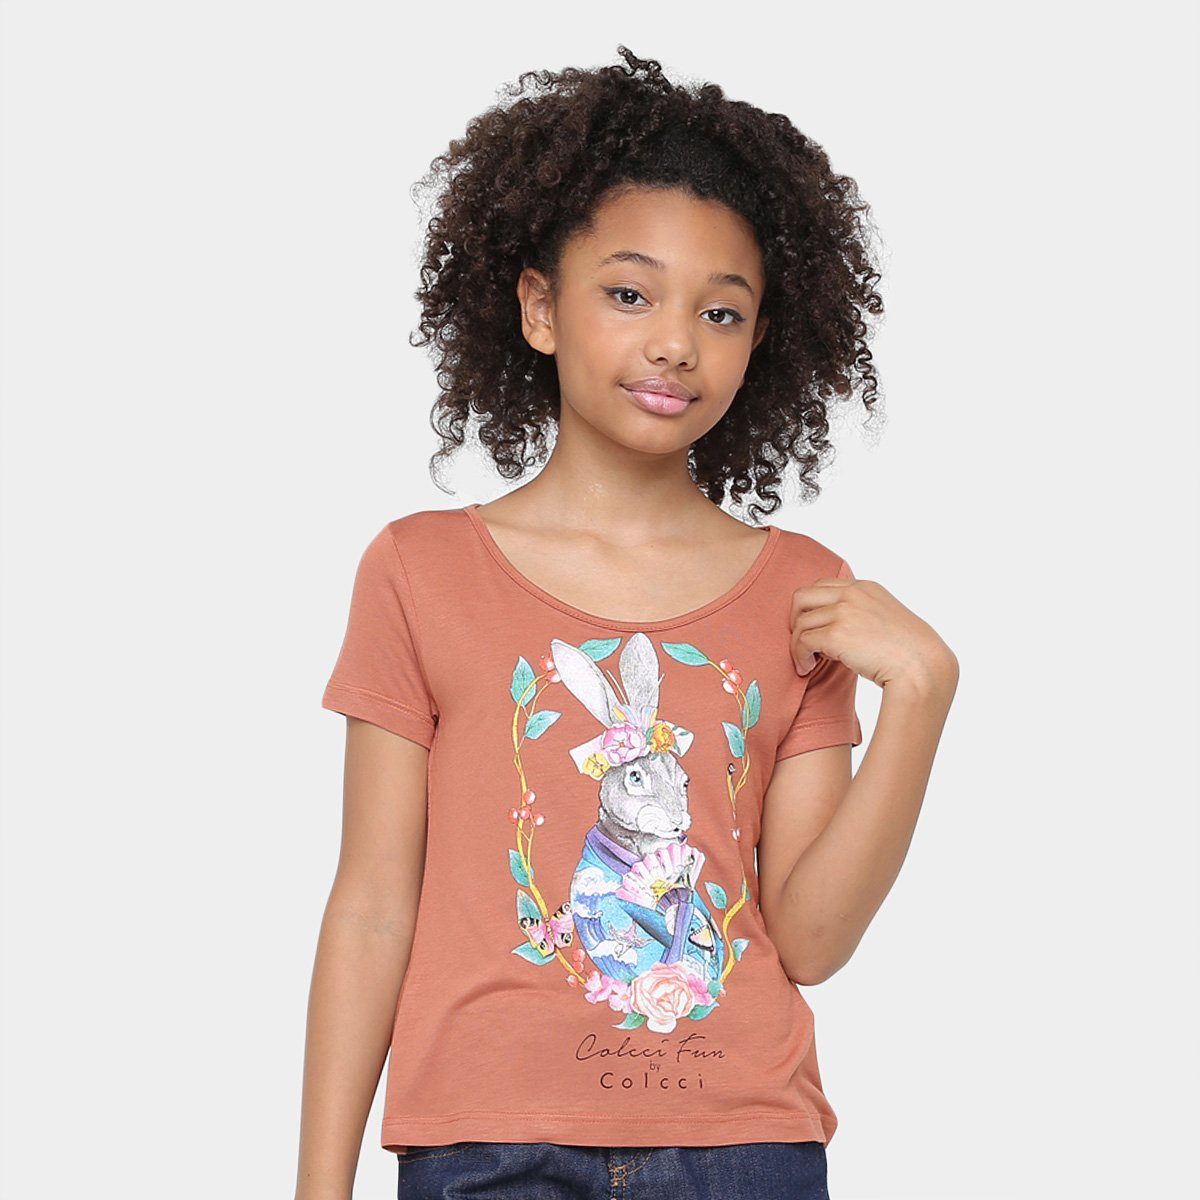 4fbf3cb20 Camiseta Infantil Colcci Marrom Estampada Feminina Fun Infantil Colcci  Camiseta Fun F4fdRq ...